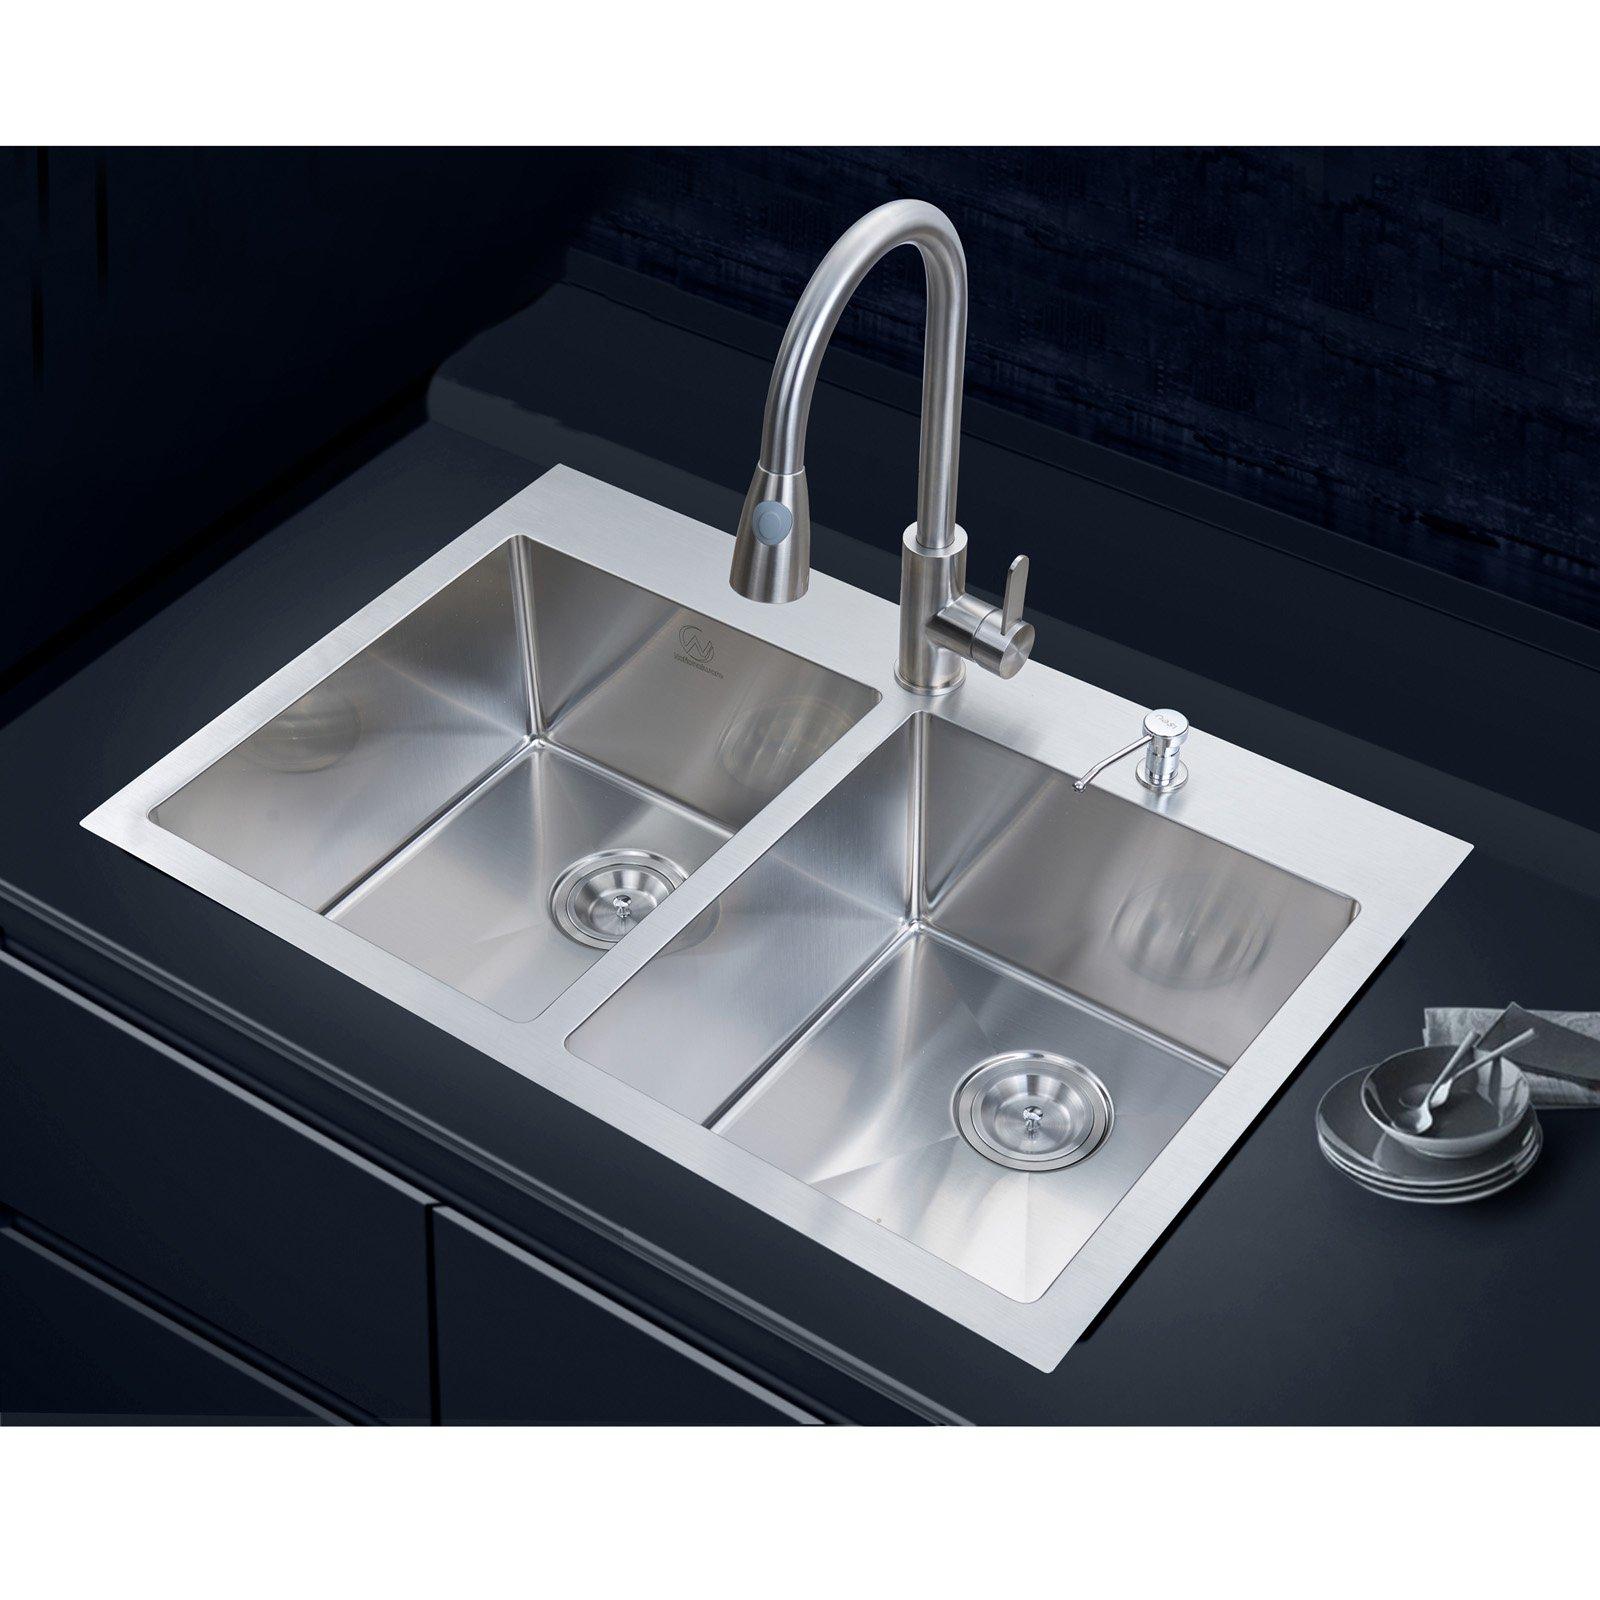 stufurhome nw 3322do double basin overmount kitchen sink walmart com rh walmart com  kitchen sinks overmount vs. undermount